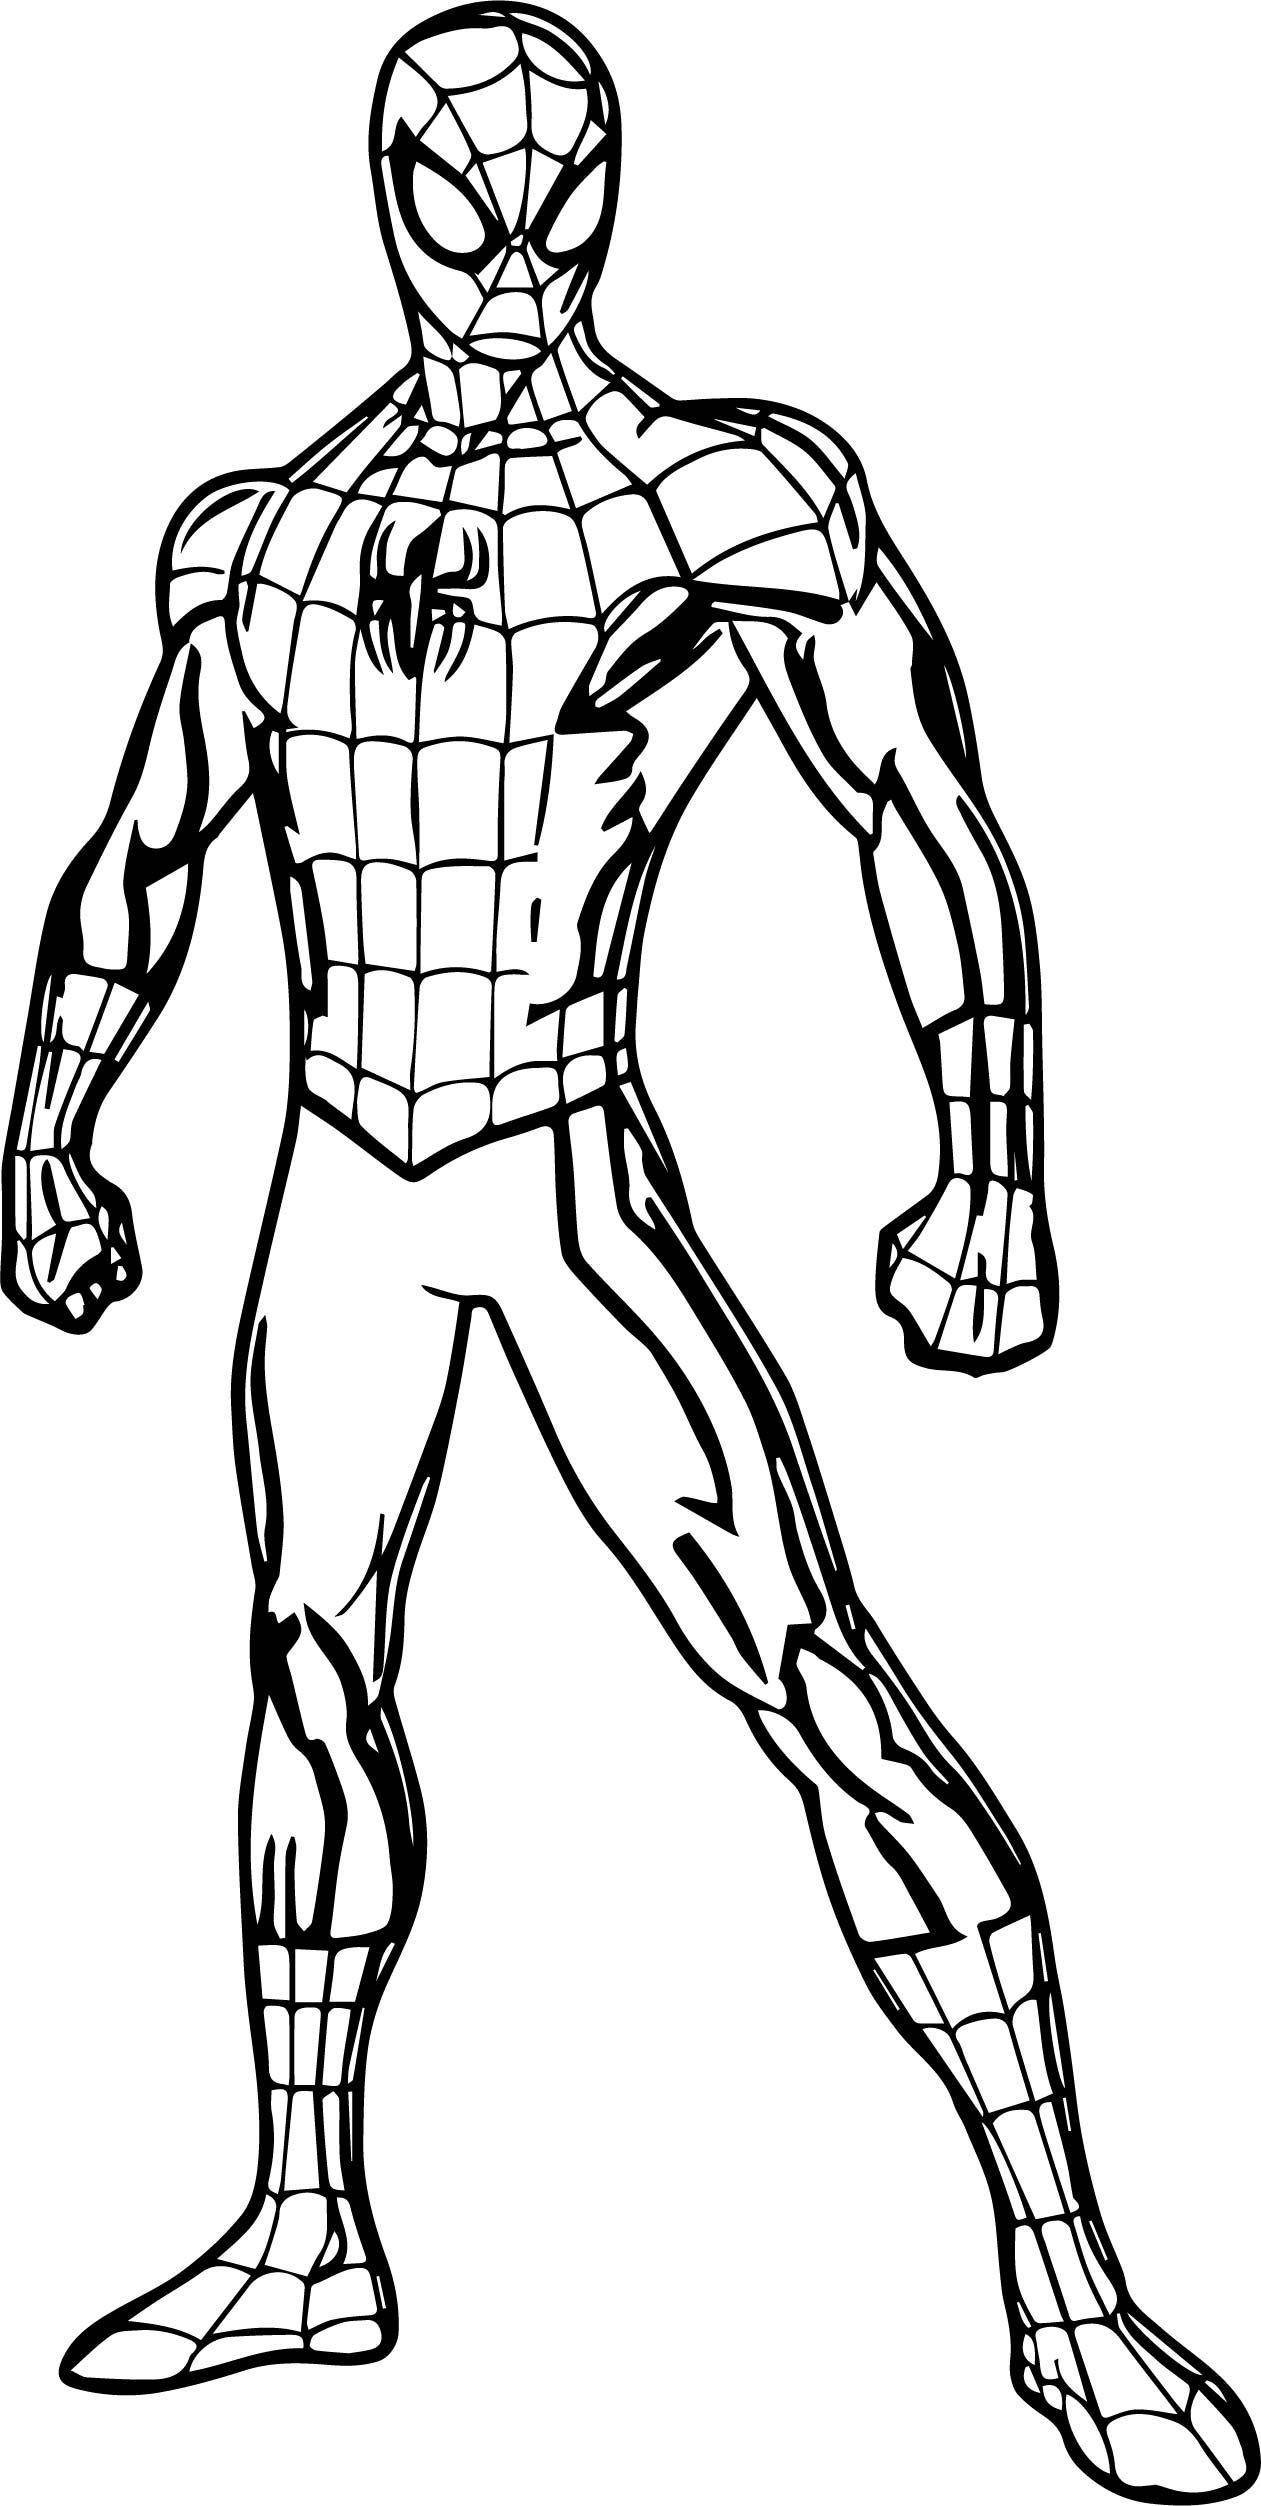 Cool Spider Man Pose Coloring Page Superhero Coloring Pages Superhero Coloring Spiderman Coloring